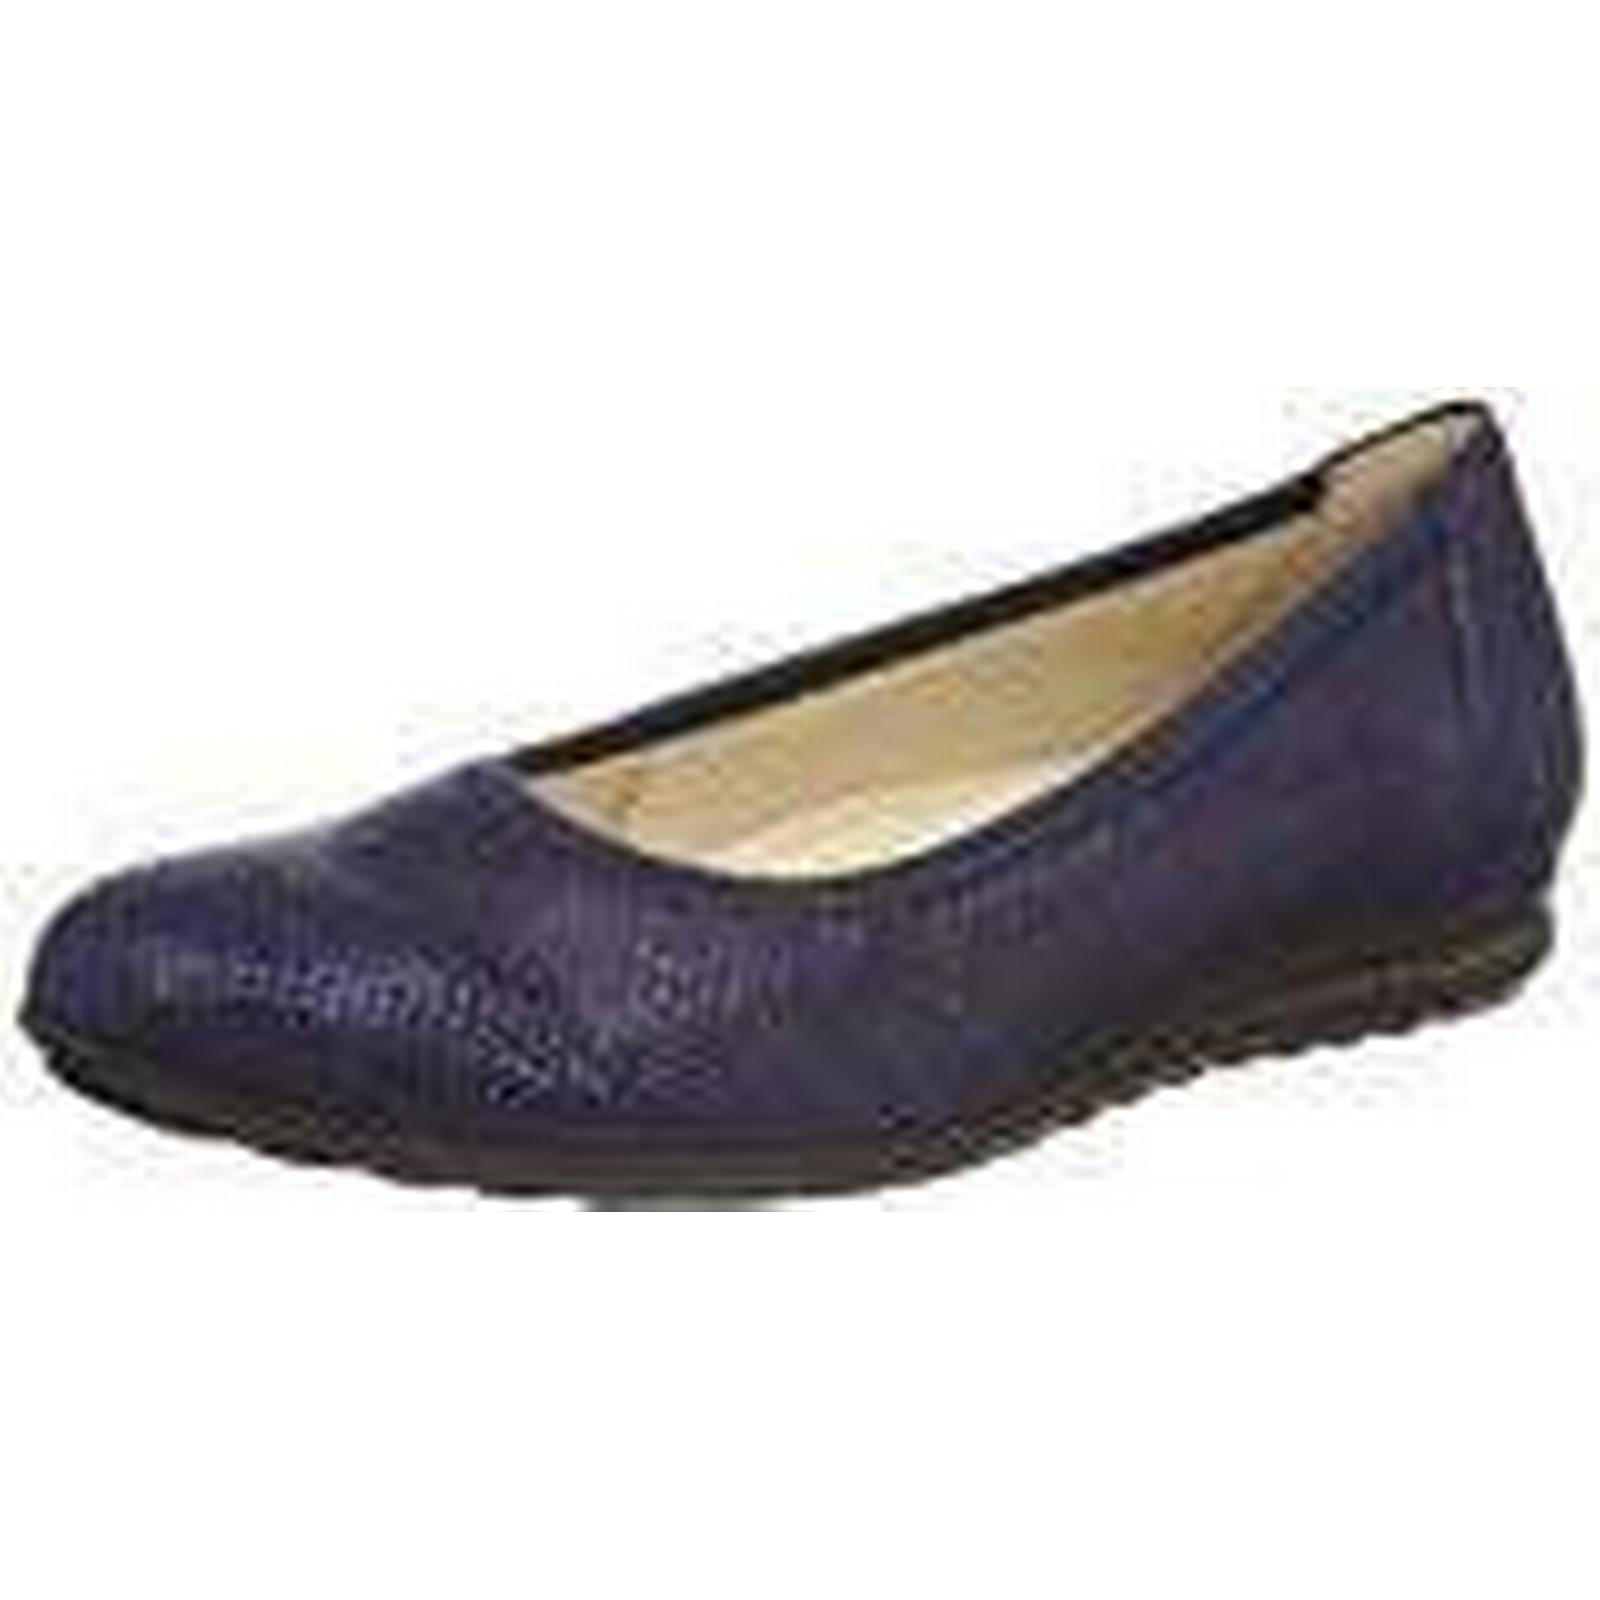 Gabor Women's Comfort Sport-Modern Closed Nightblue Toe Ballet Flats, Blue Nightblue Closed 26, 4 UK 4 UK 0bcce0